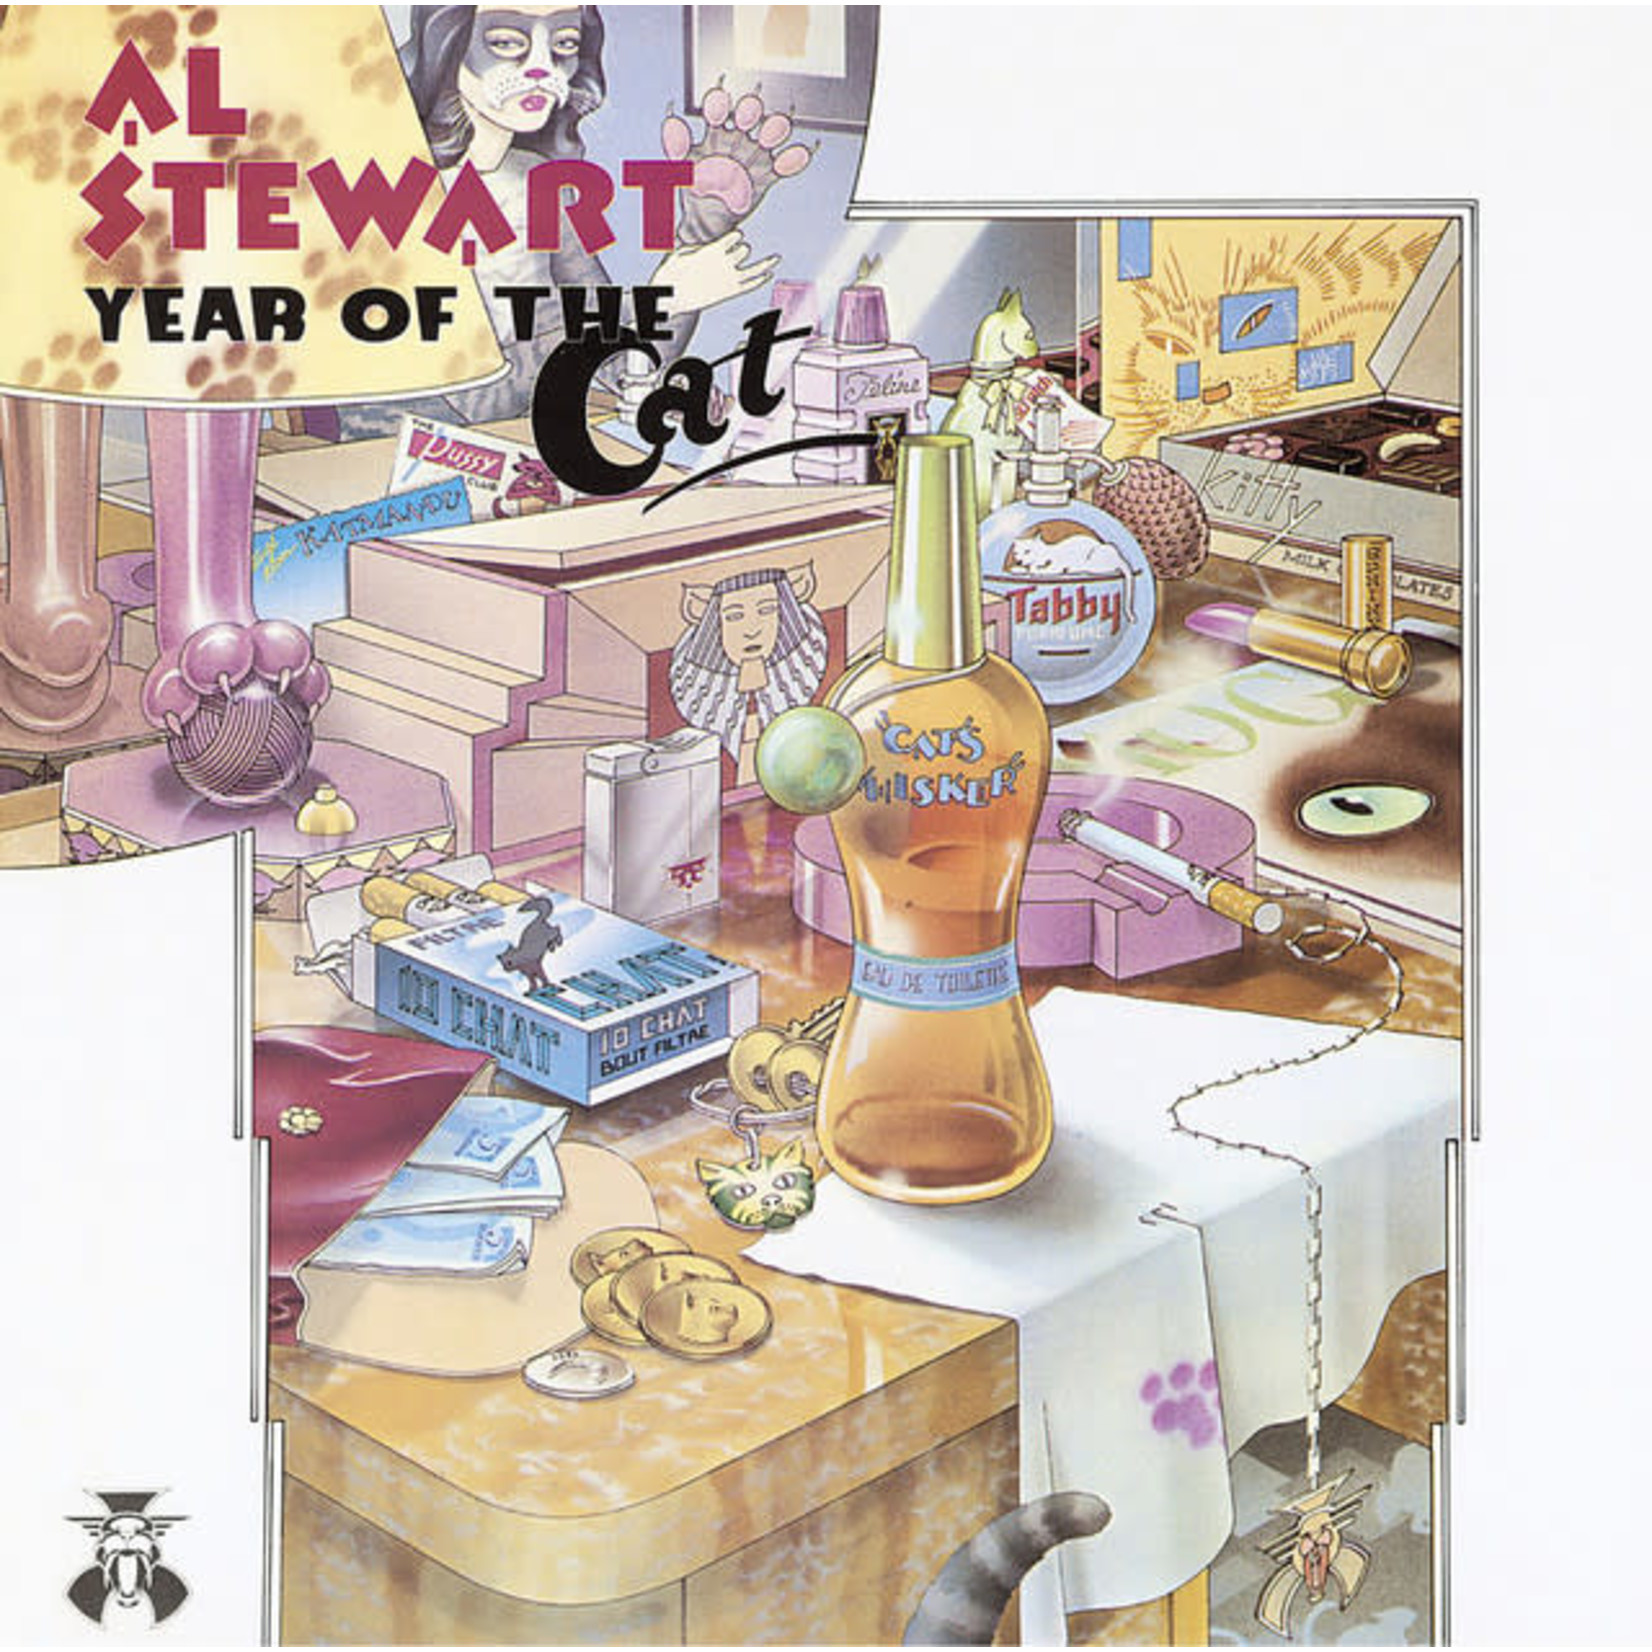 Vinyl Al Stewart - Year of the Cat